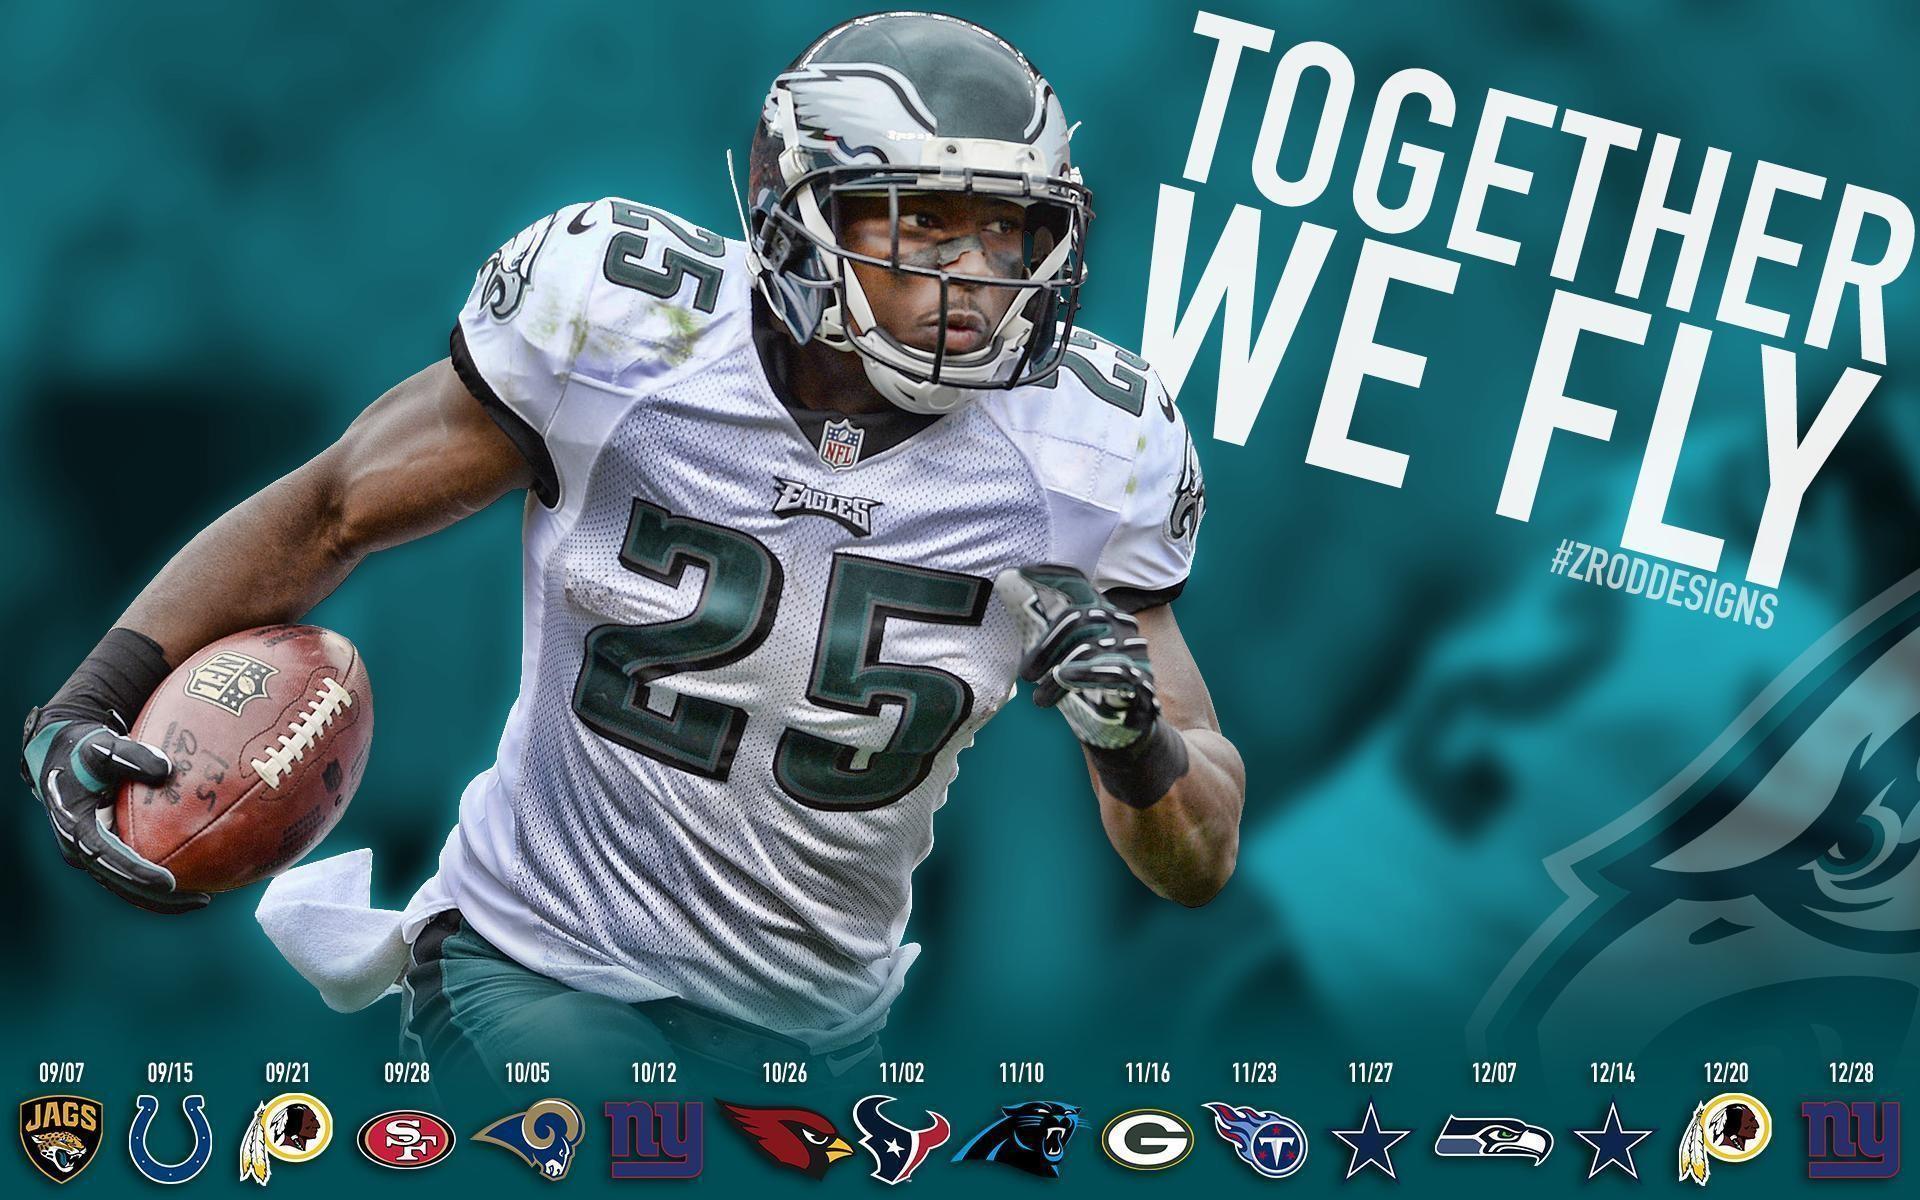 Philadelphia Eagles 2016 Schedule Wallpaper – WallpaperSafari